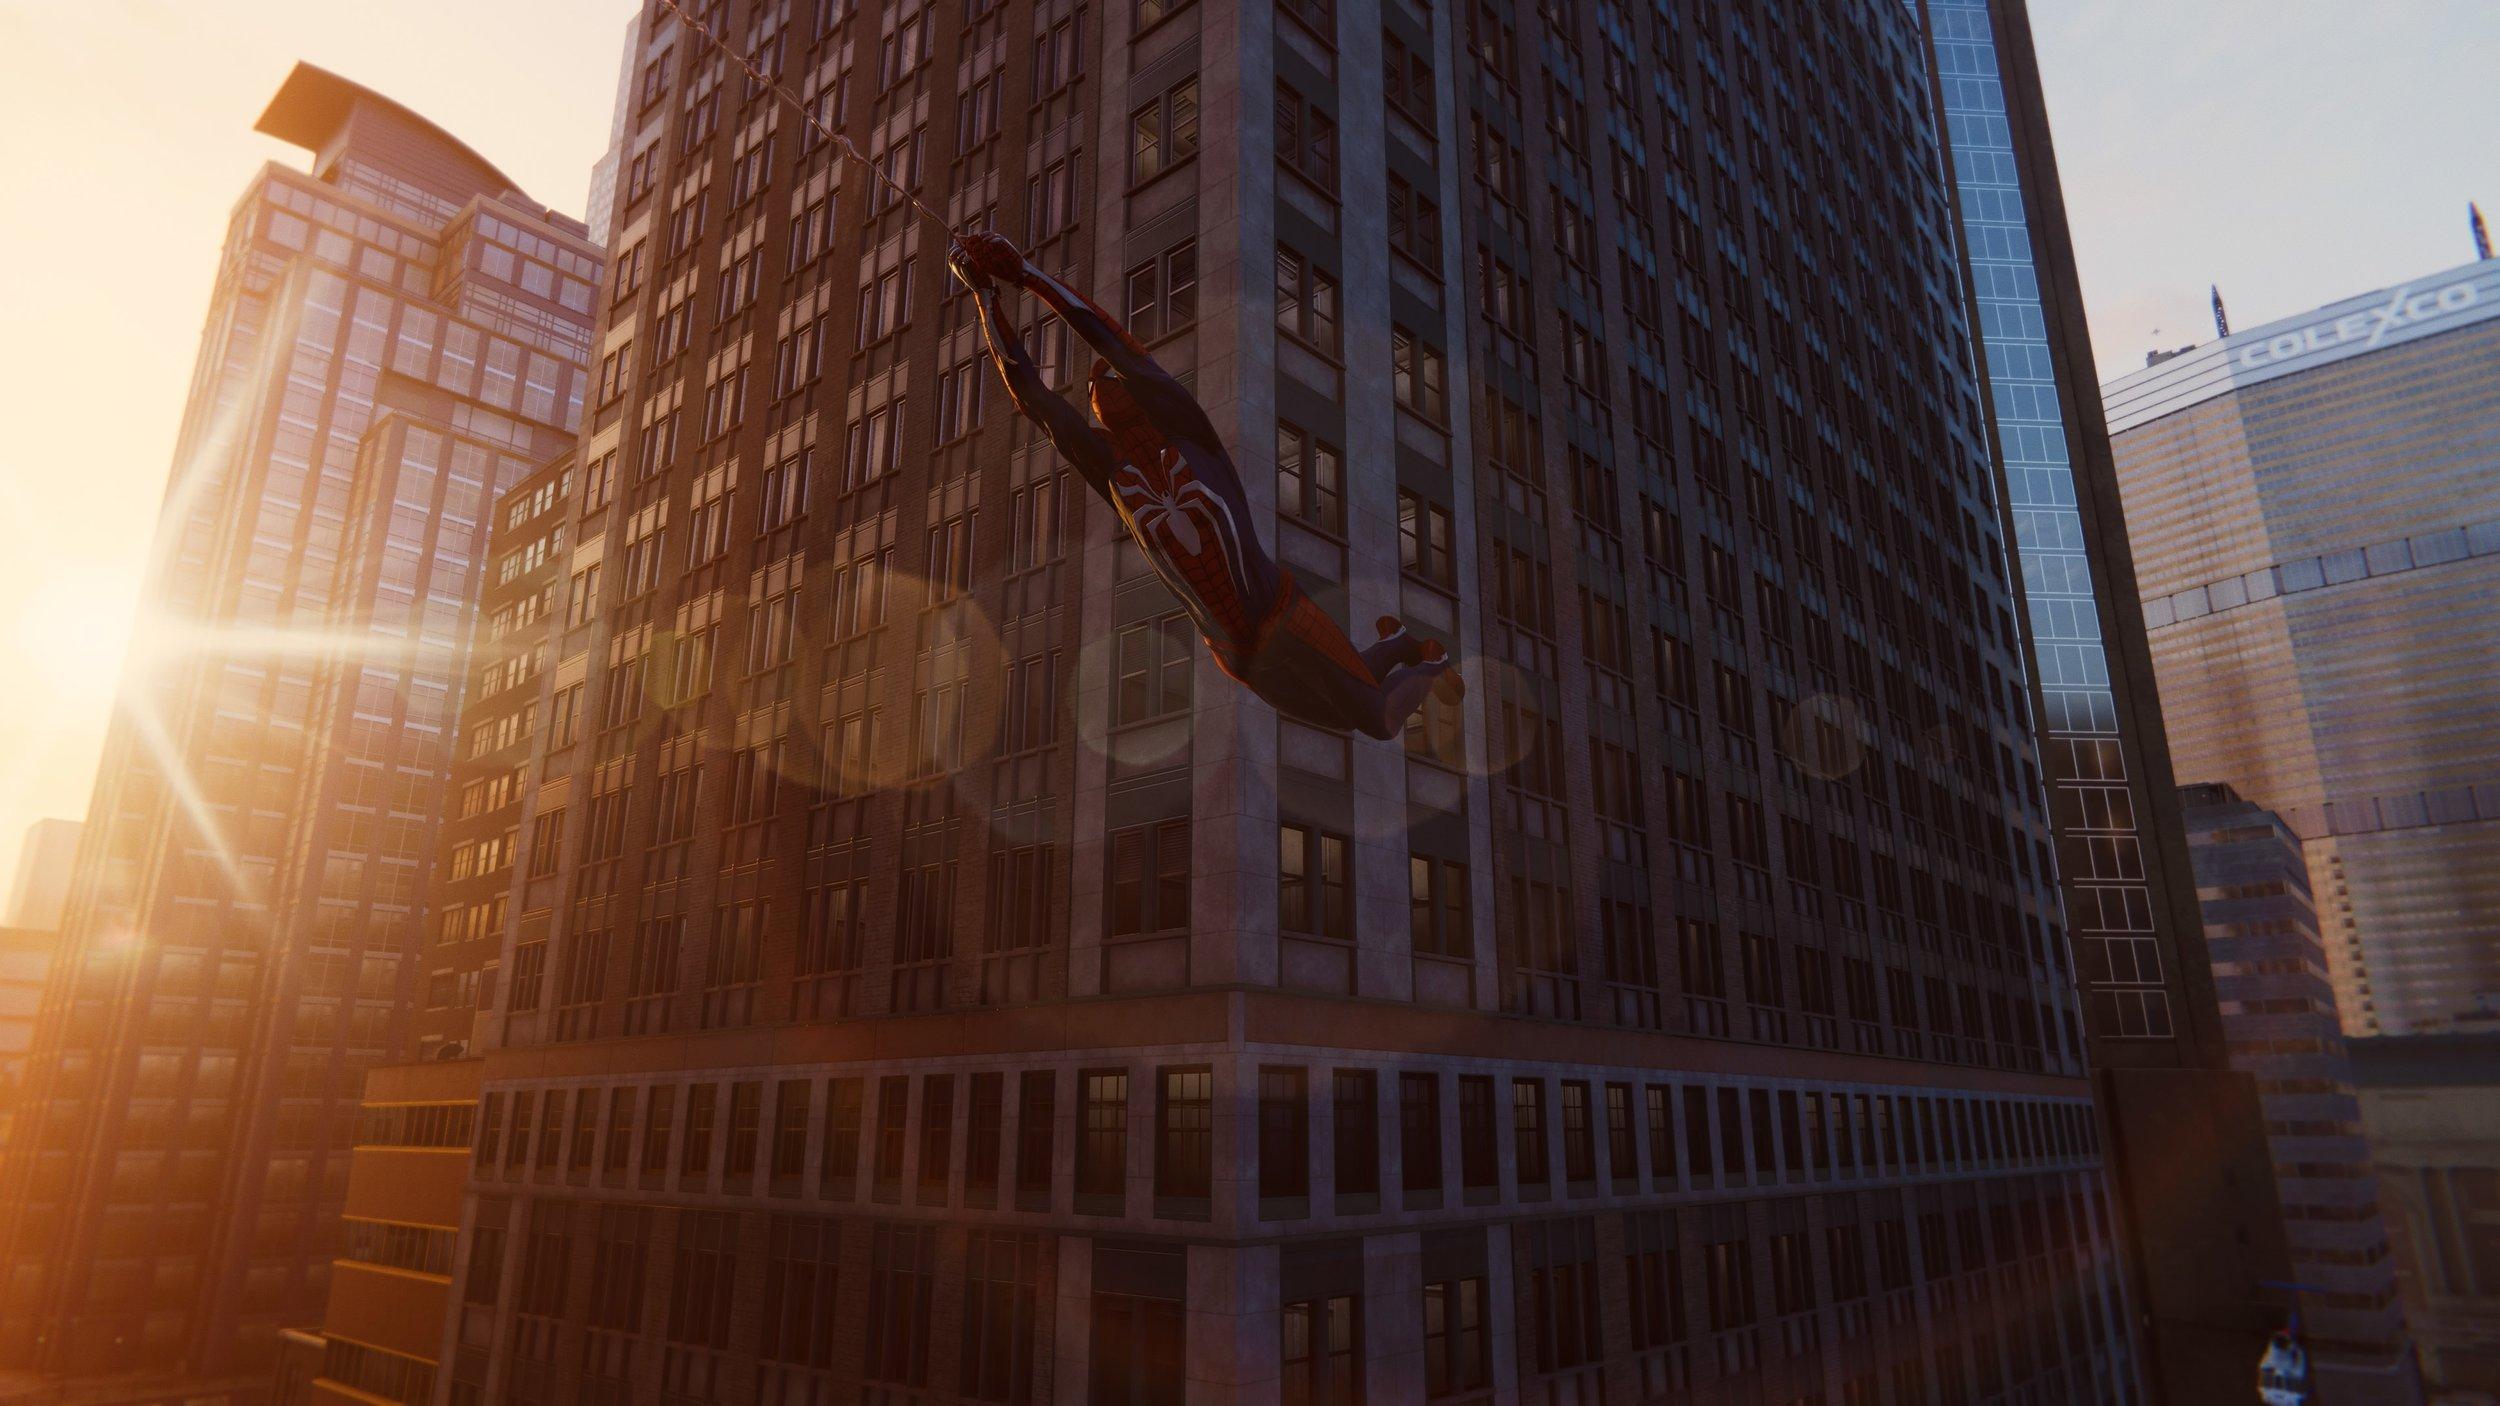 Stunning Sunset Spider-Man Shot (SSSS) in action!